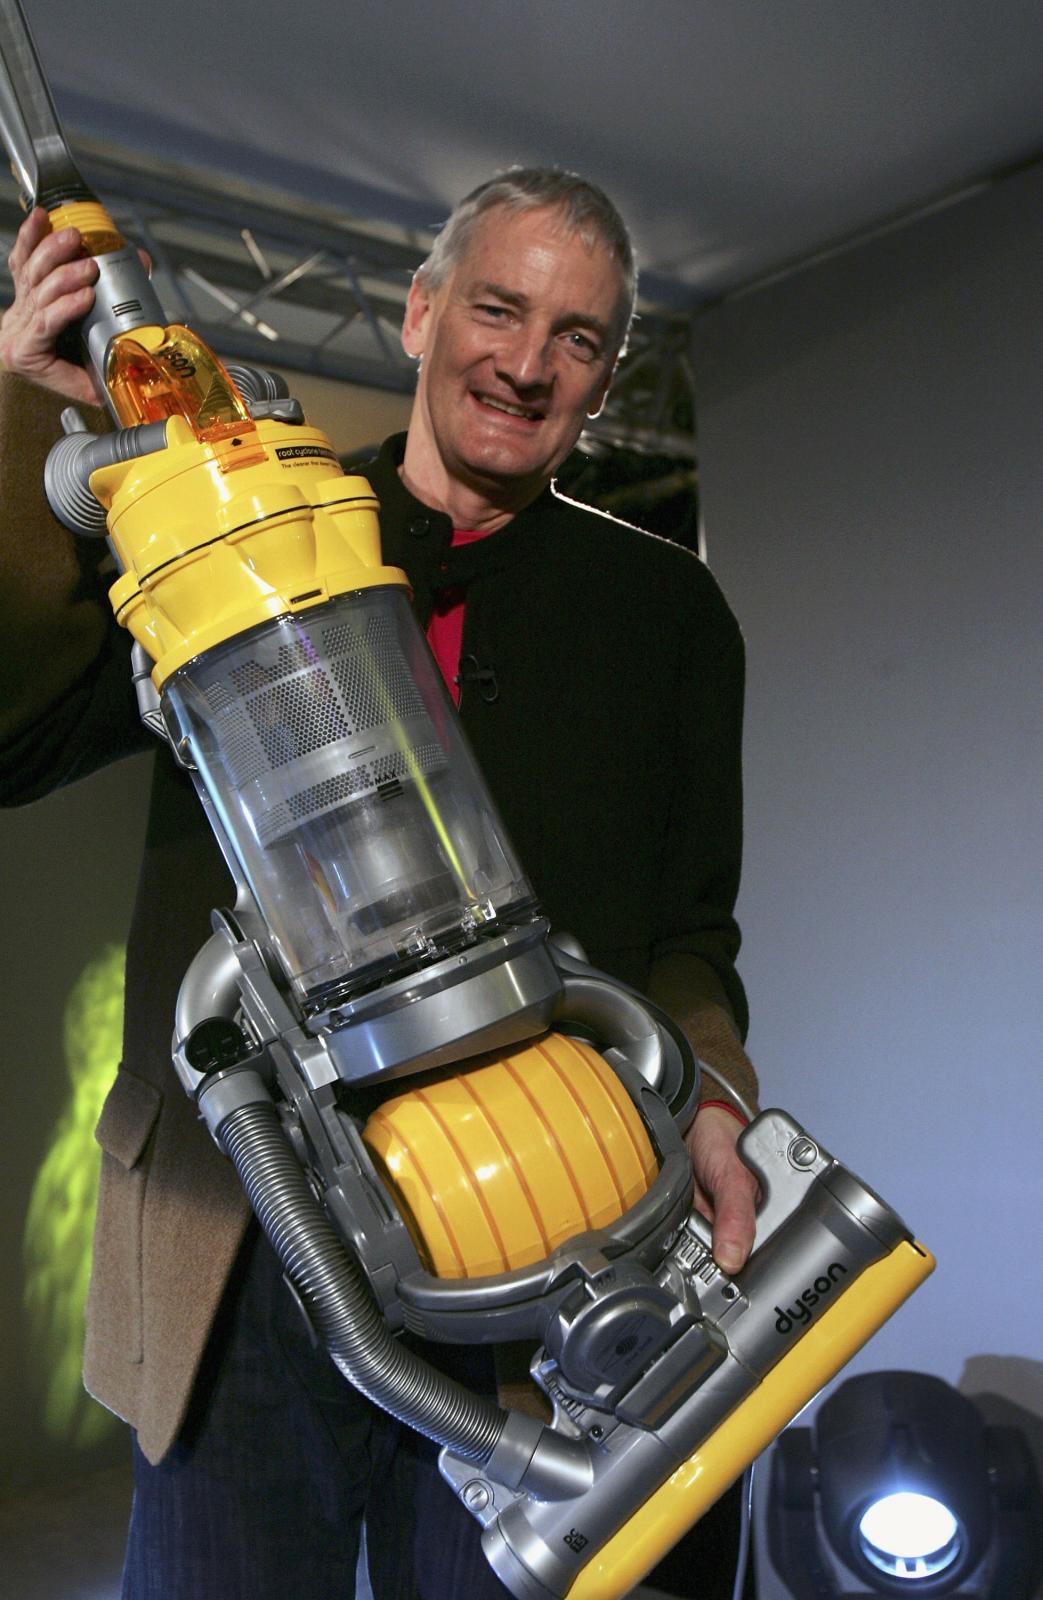 Dyson-Gründer James Dyson hält einen Dyson Staubsauger hoch